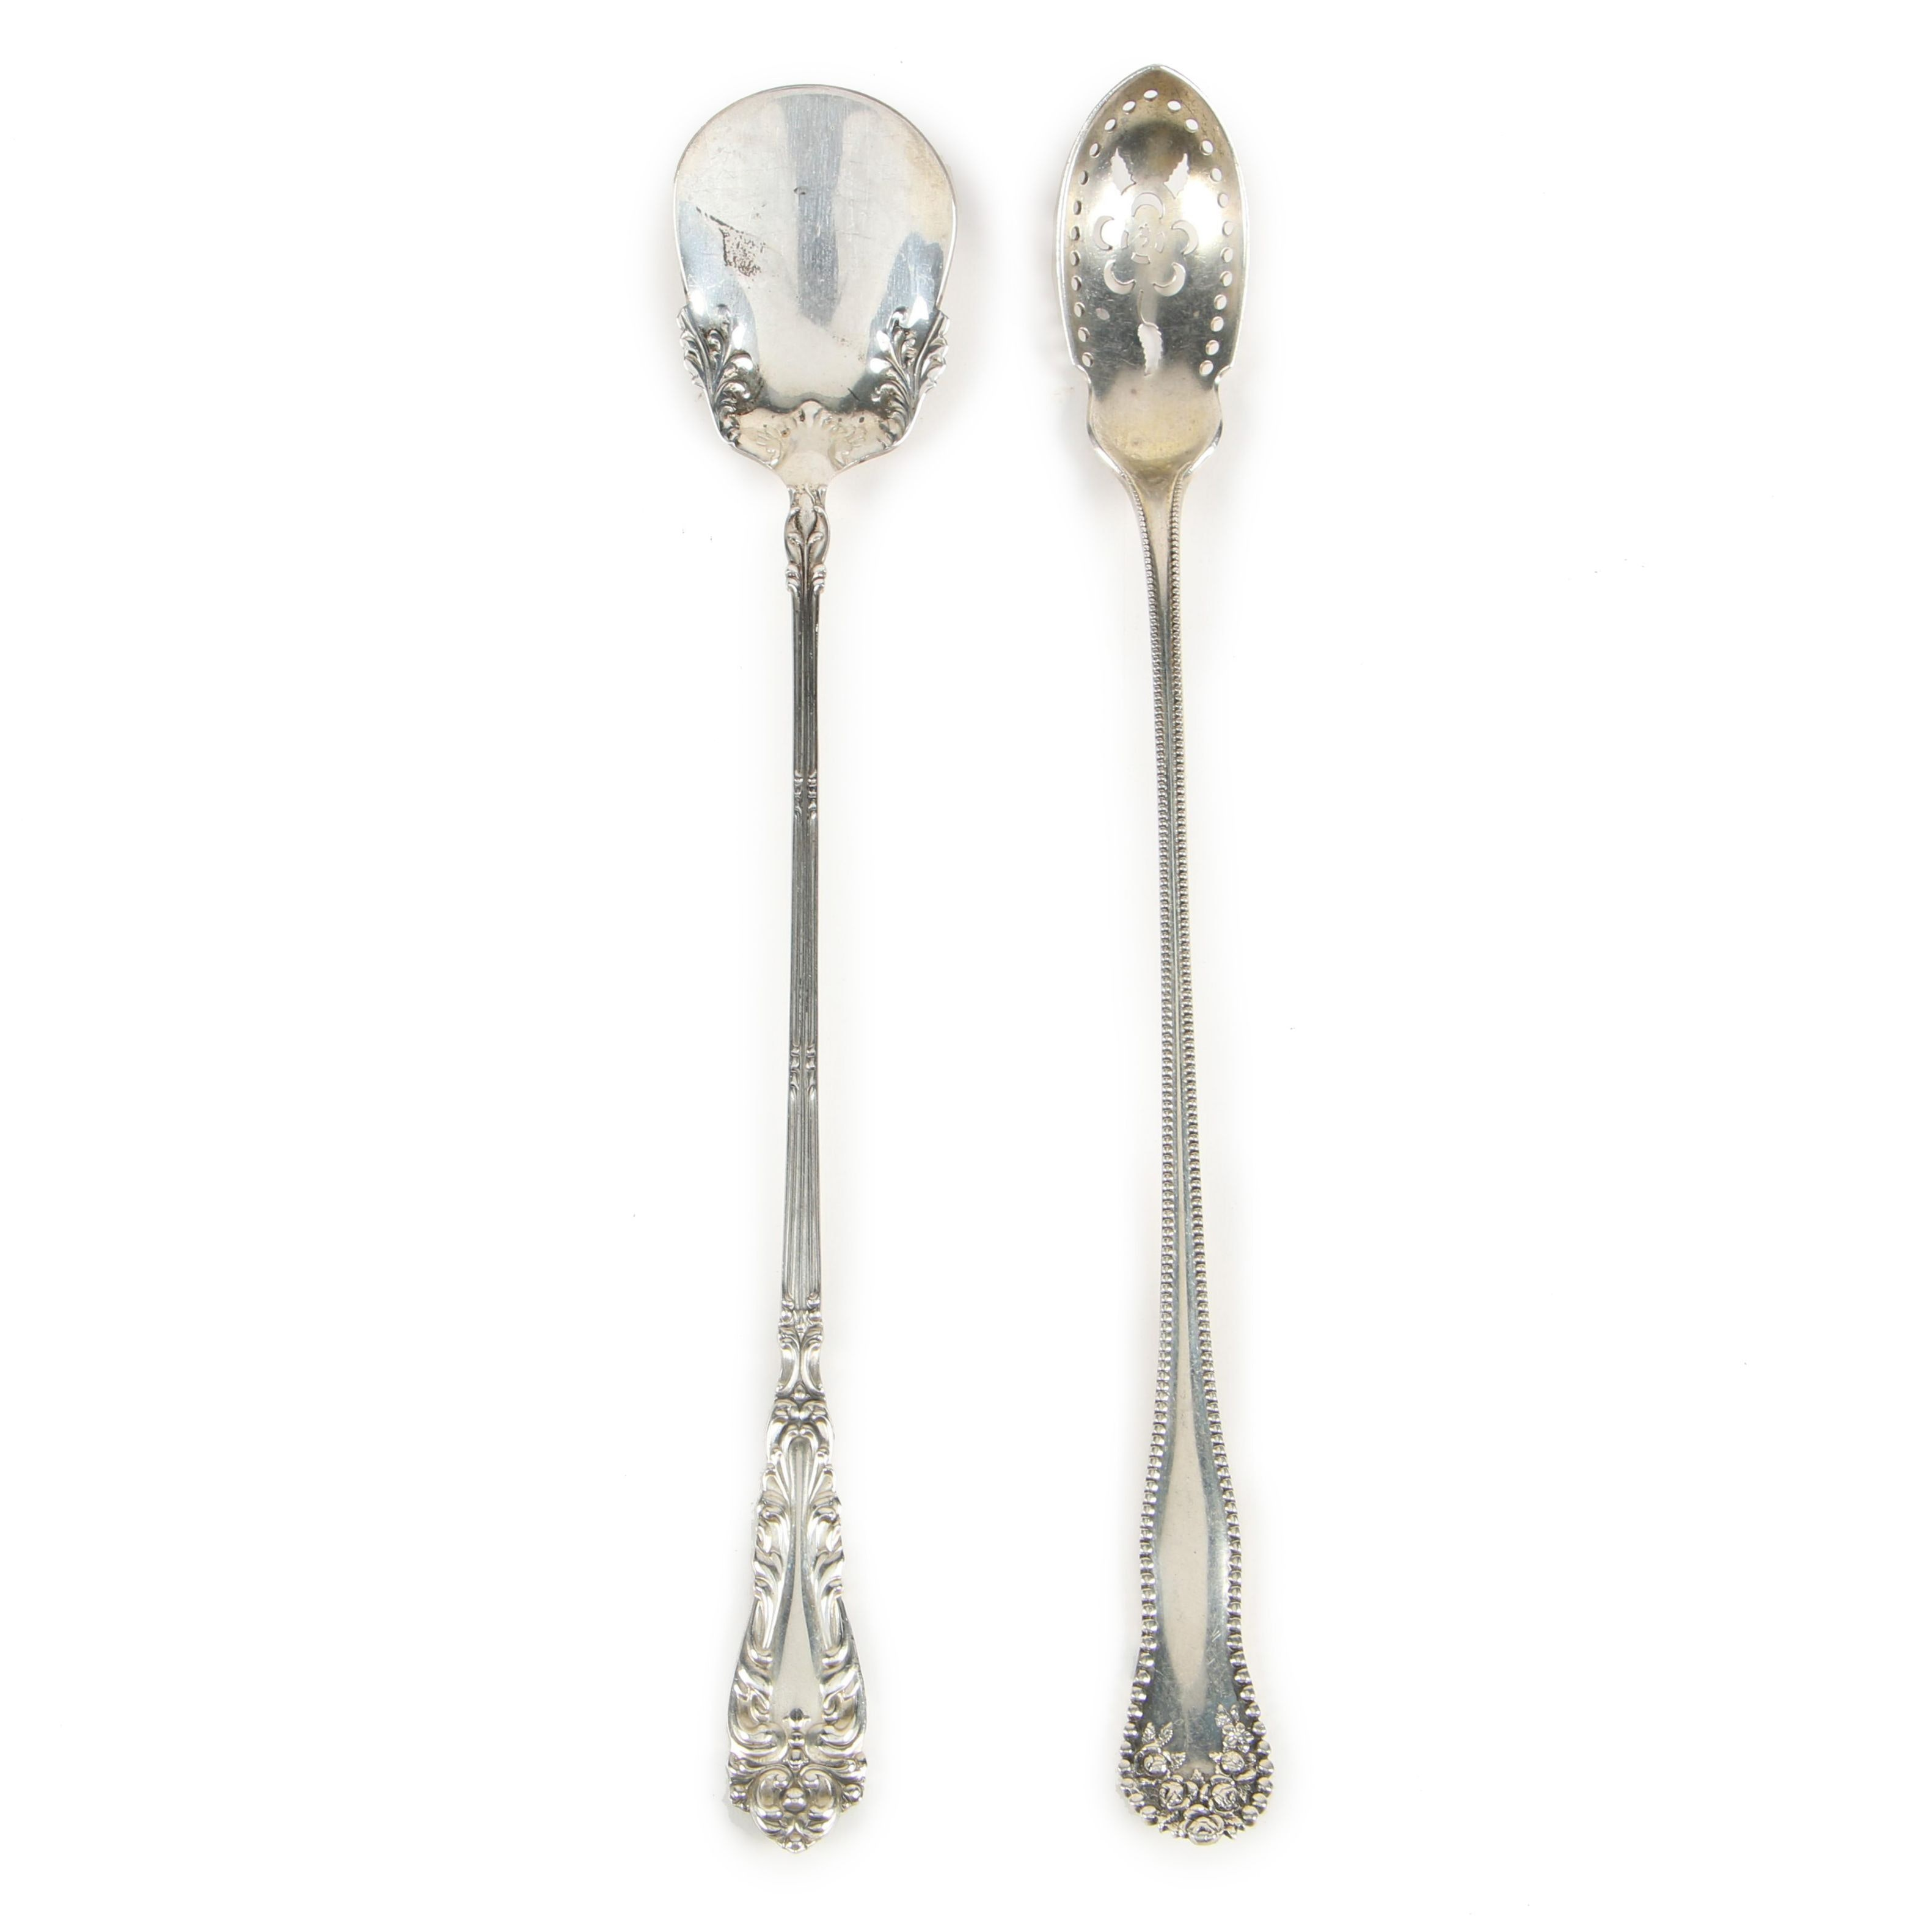 "Gorham ""Lancaster"" Olive Spoon and Amston ""Crescendo"" Condiment Spoon"